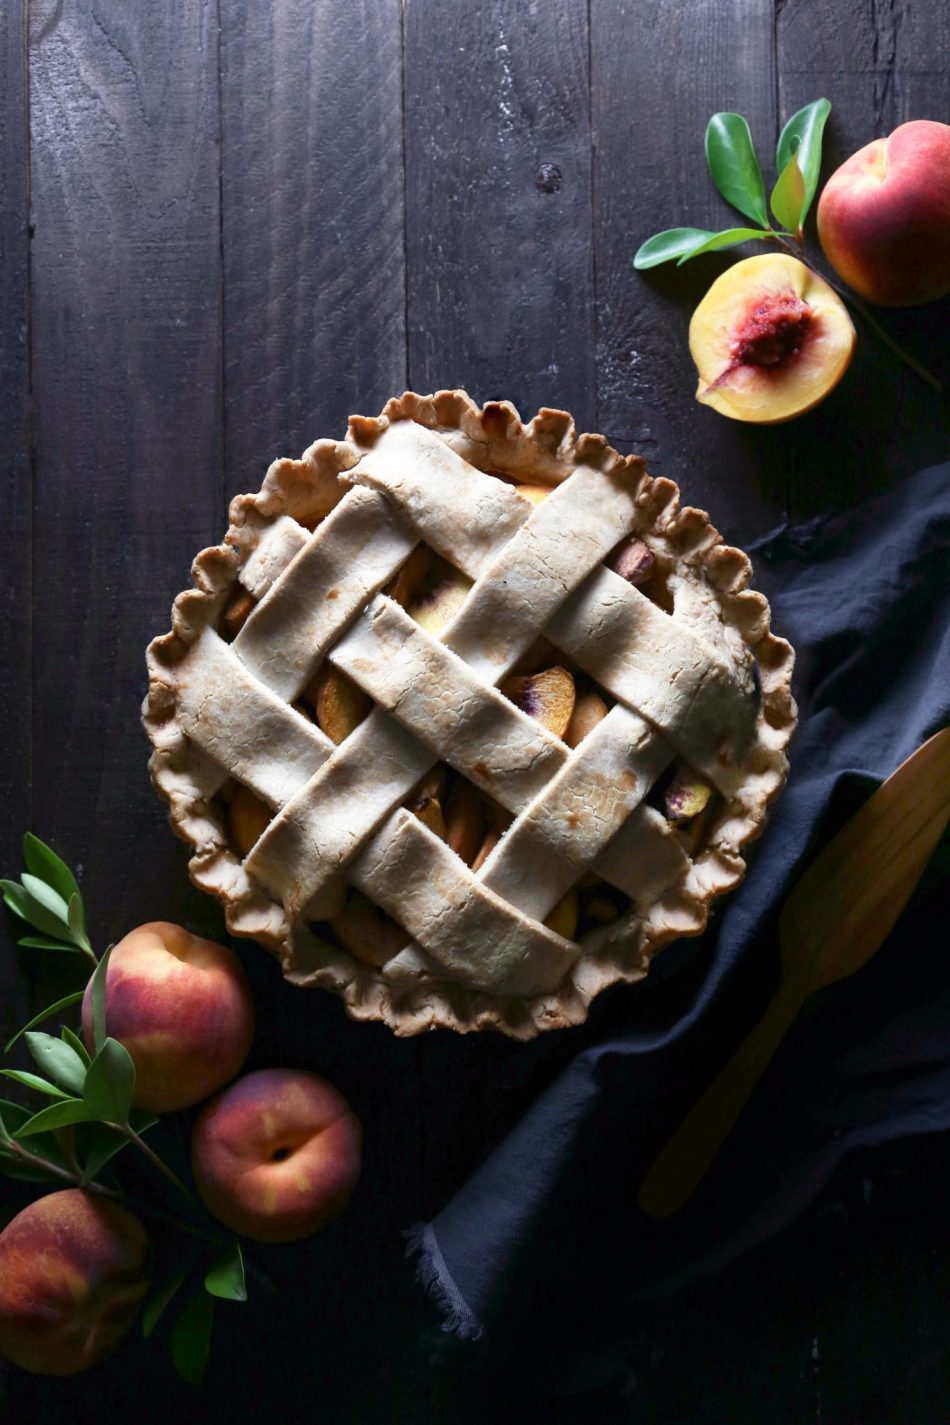 http://www.wifemamafoodie.com/simple-peach-pie-gluten-dairy-refined-sugar-free/